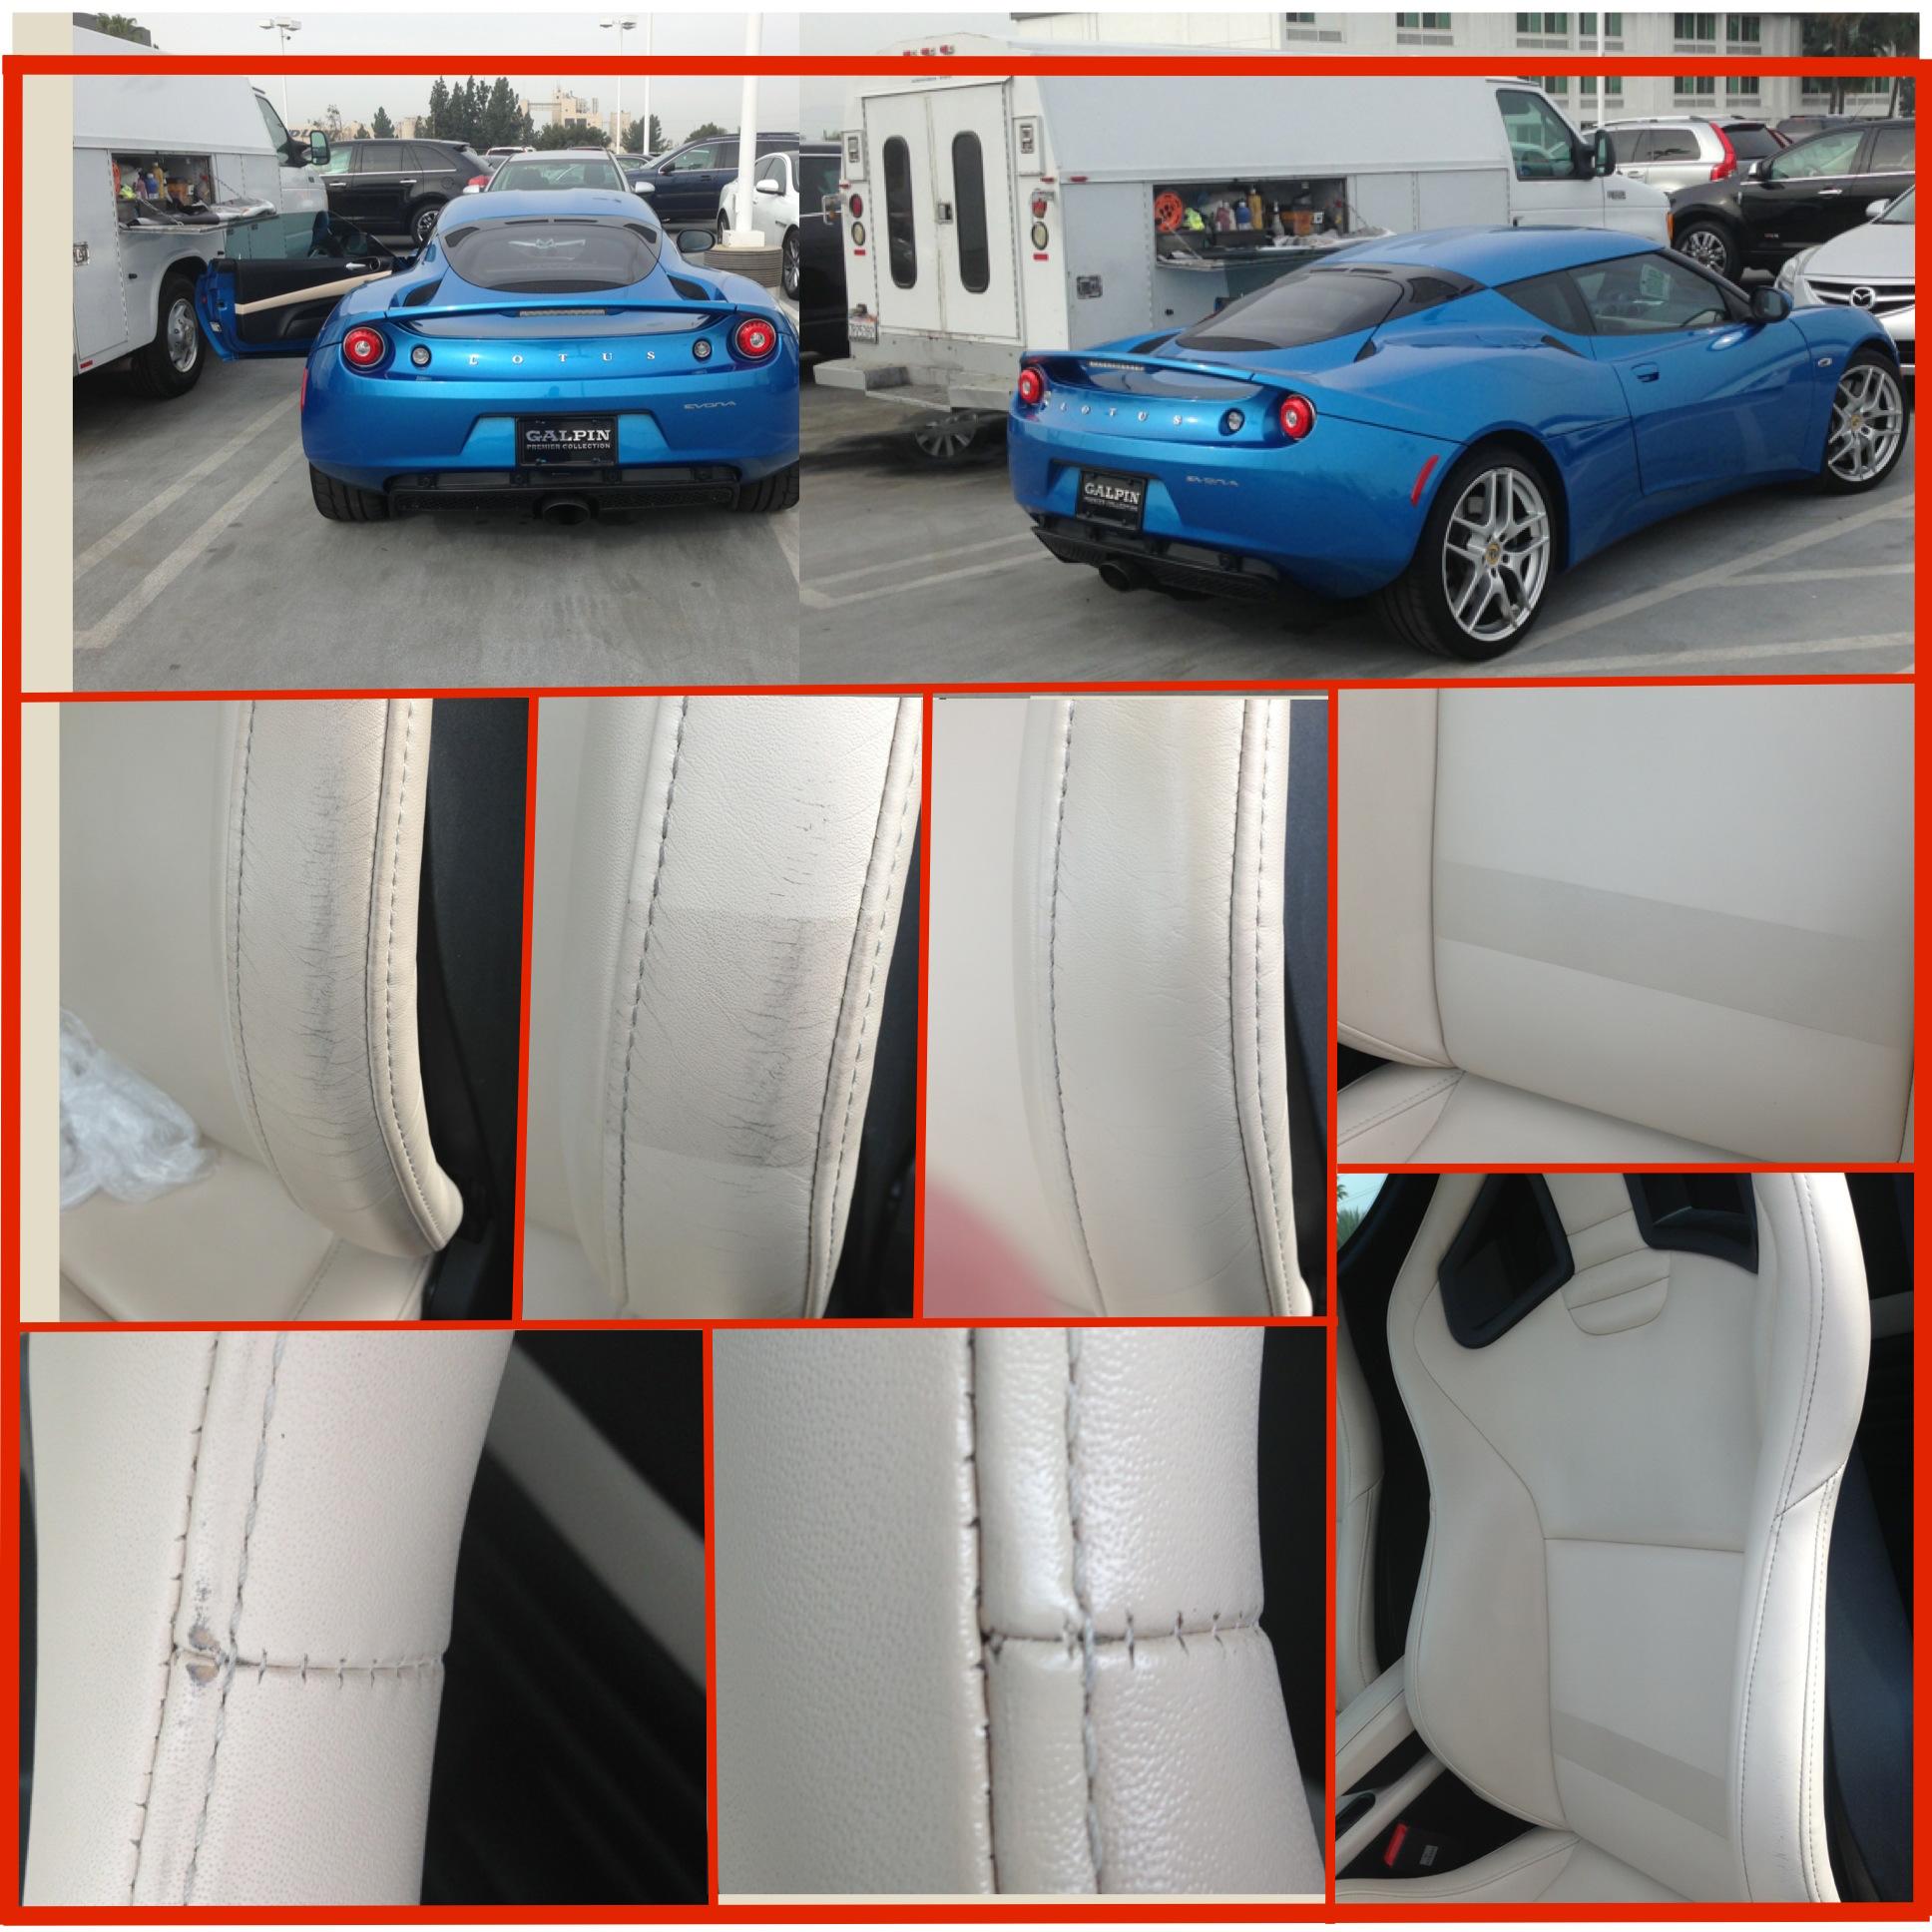 auto with lamborghini launches in division house newsfeatures restoration interior sv gorgeous miura